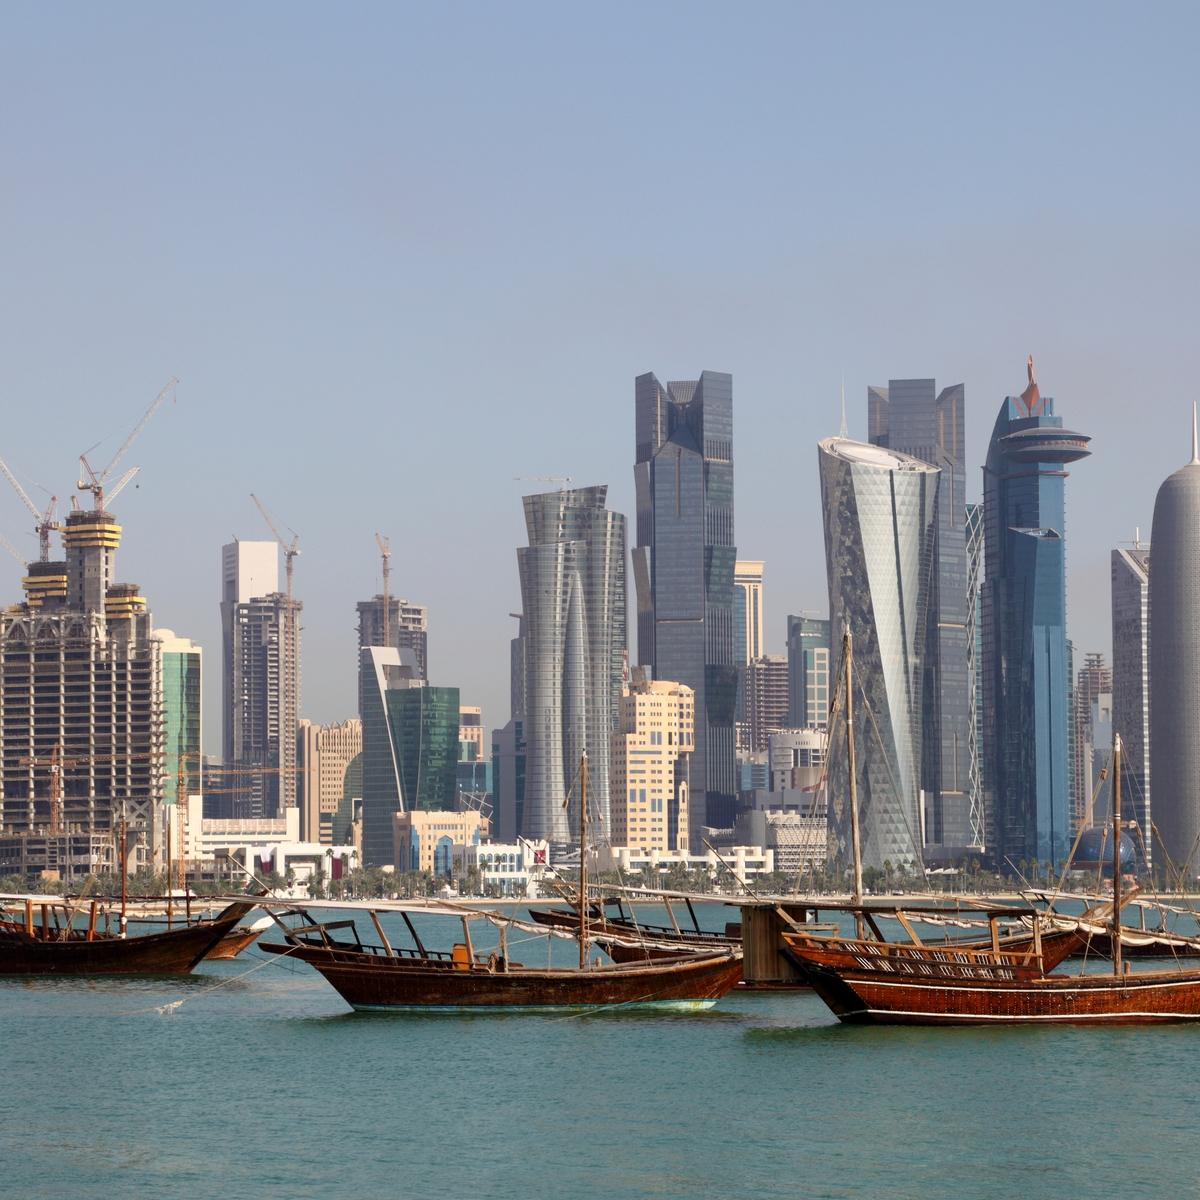 Dhau-Rundfahrt zum Sonnenuntergang in Corniche, Doha, Qatar